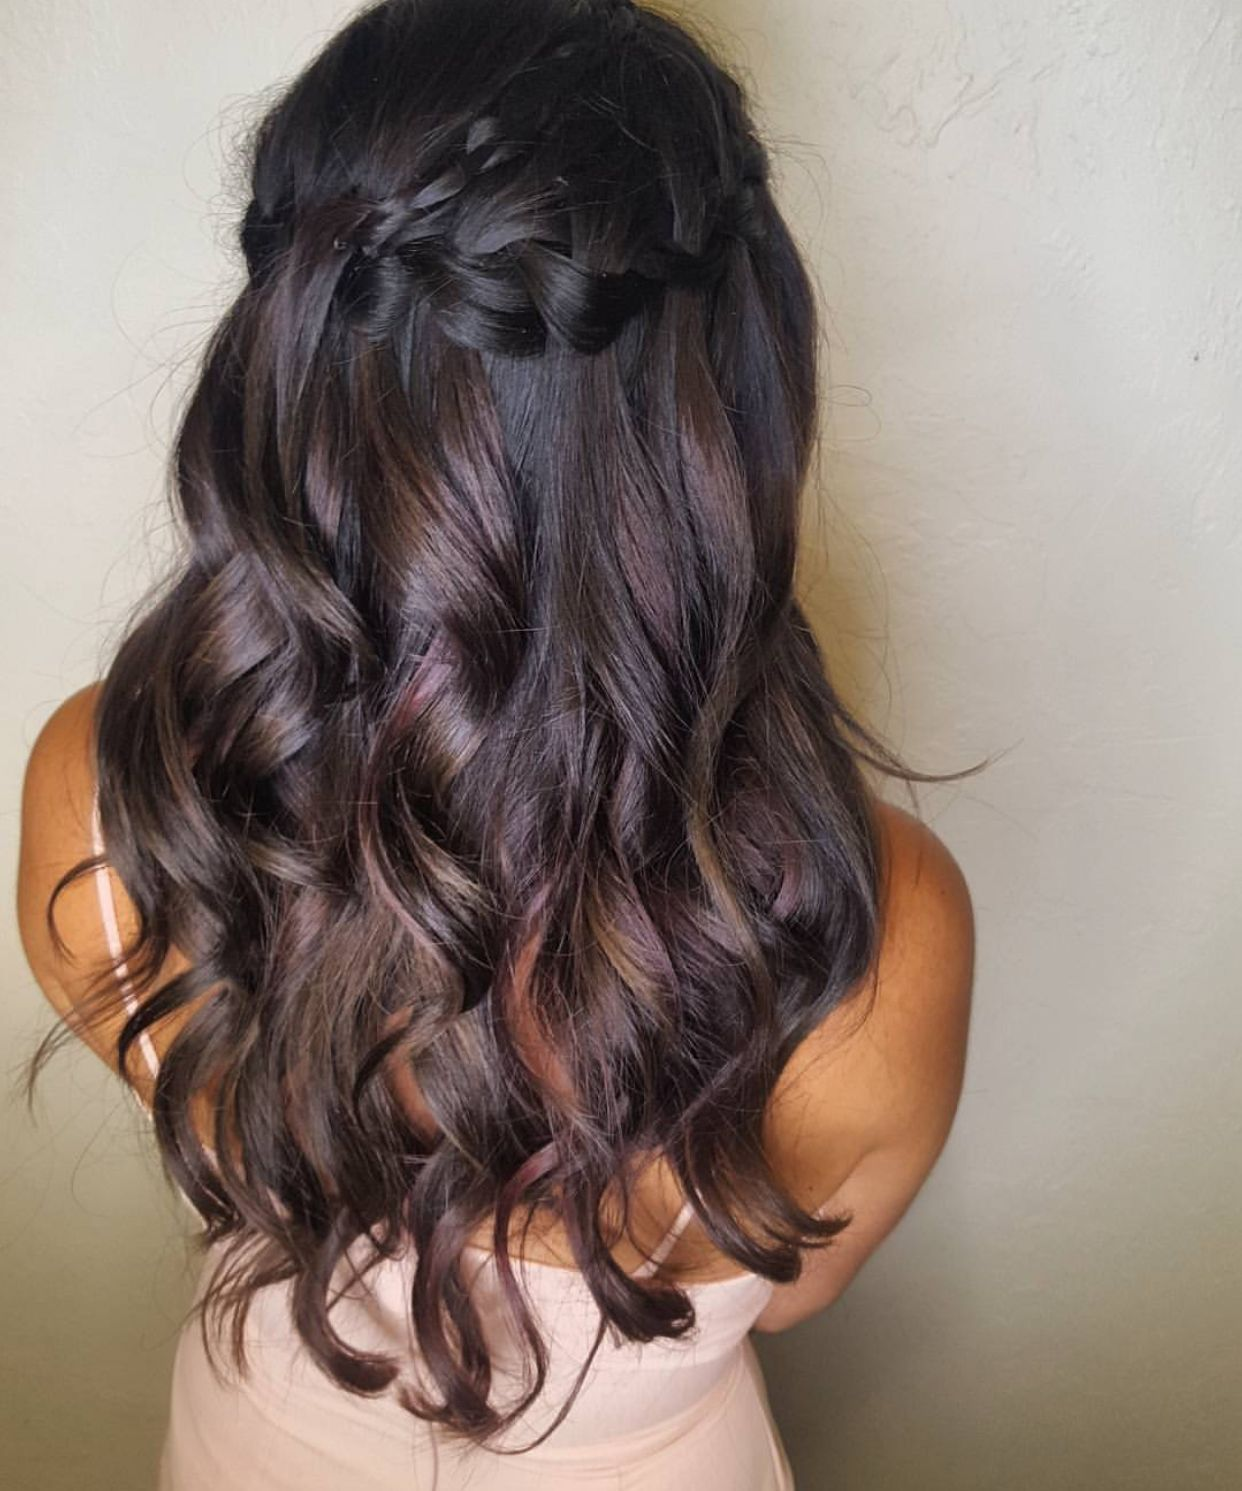 Braided half up half down brunette long hair hair by amanda